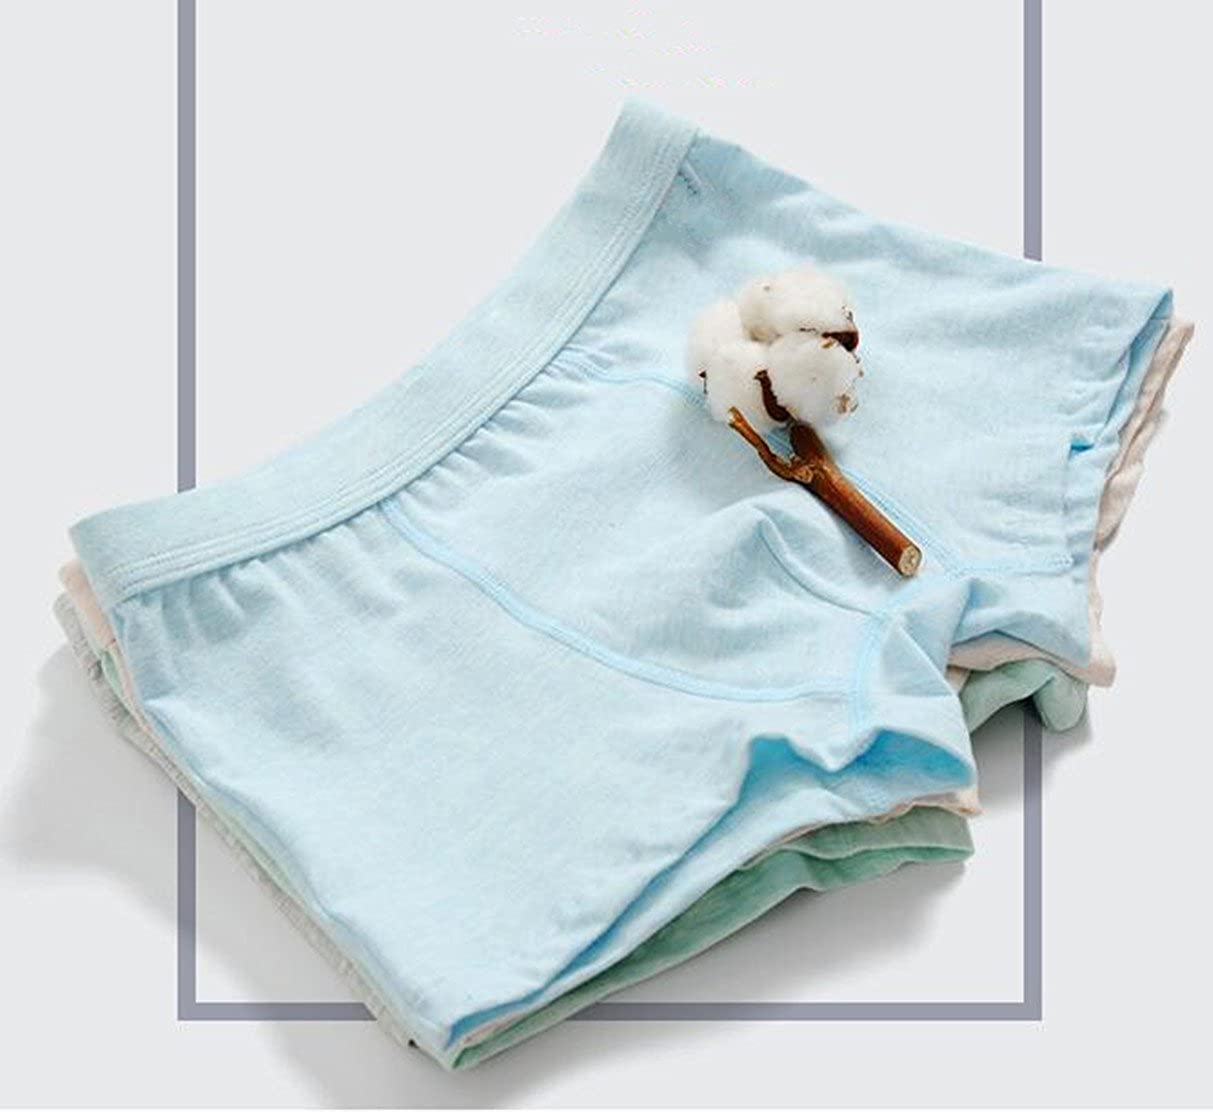 zw99 Store Little//Big Boys Underwear Briefs Comfortable Cotton Panties 5-6 Years